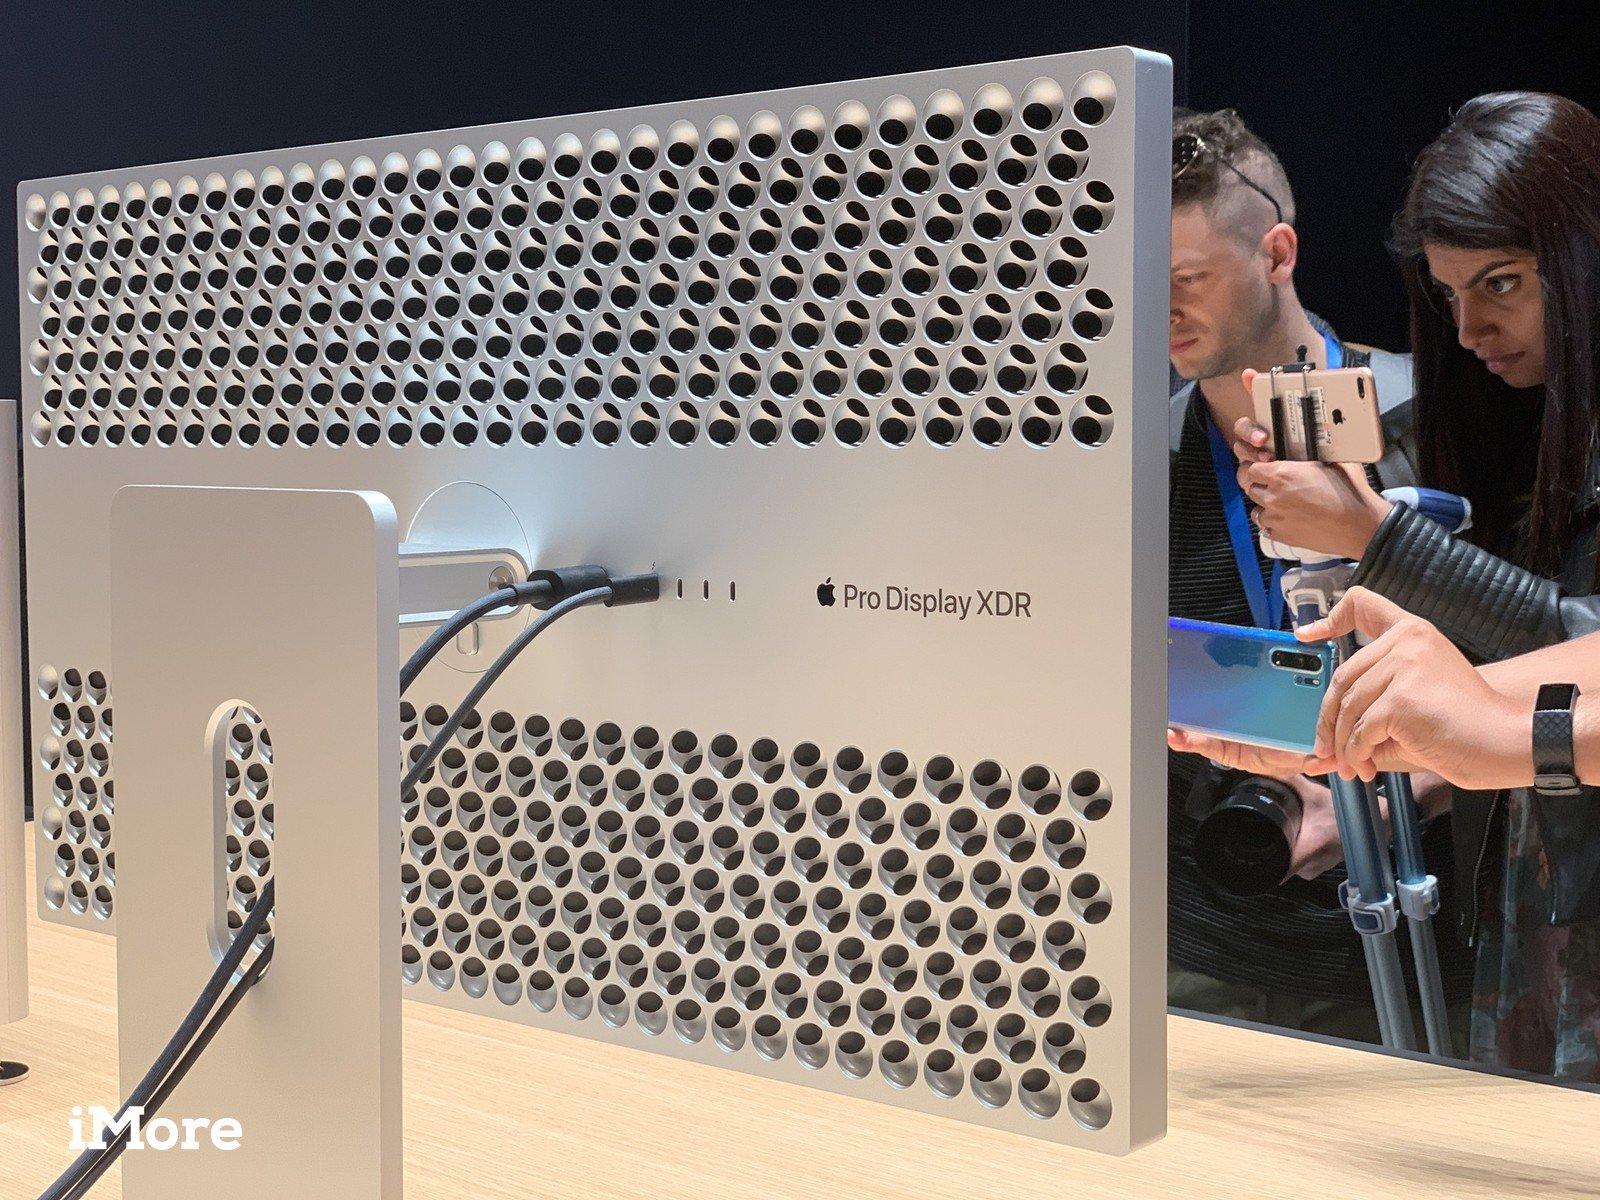 Apple-Pro-Display-XDR-iMore Das Problem mit dem Apple Pro Display XDR